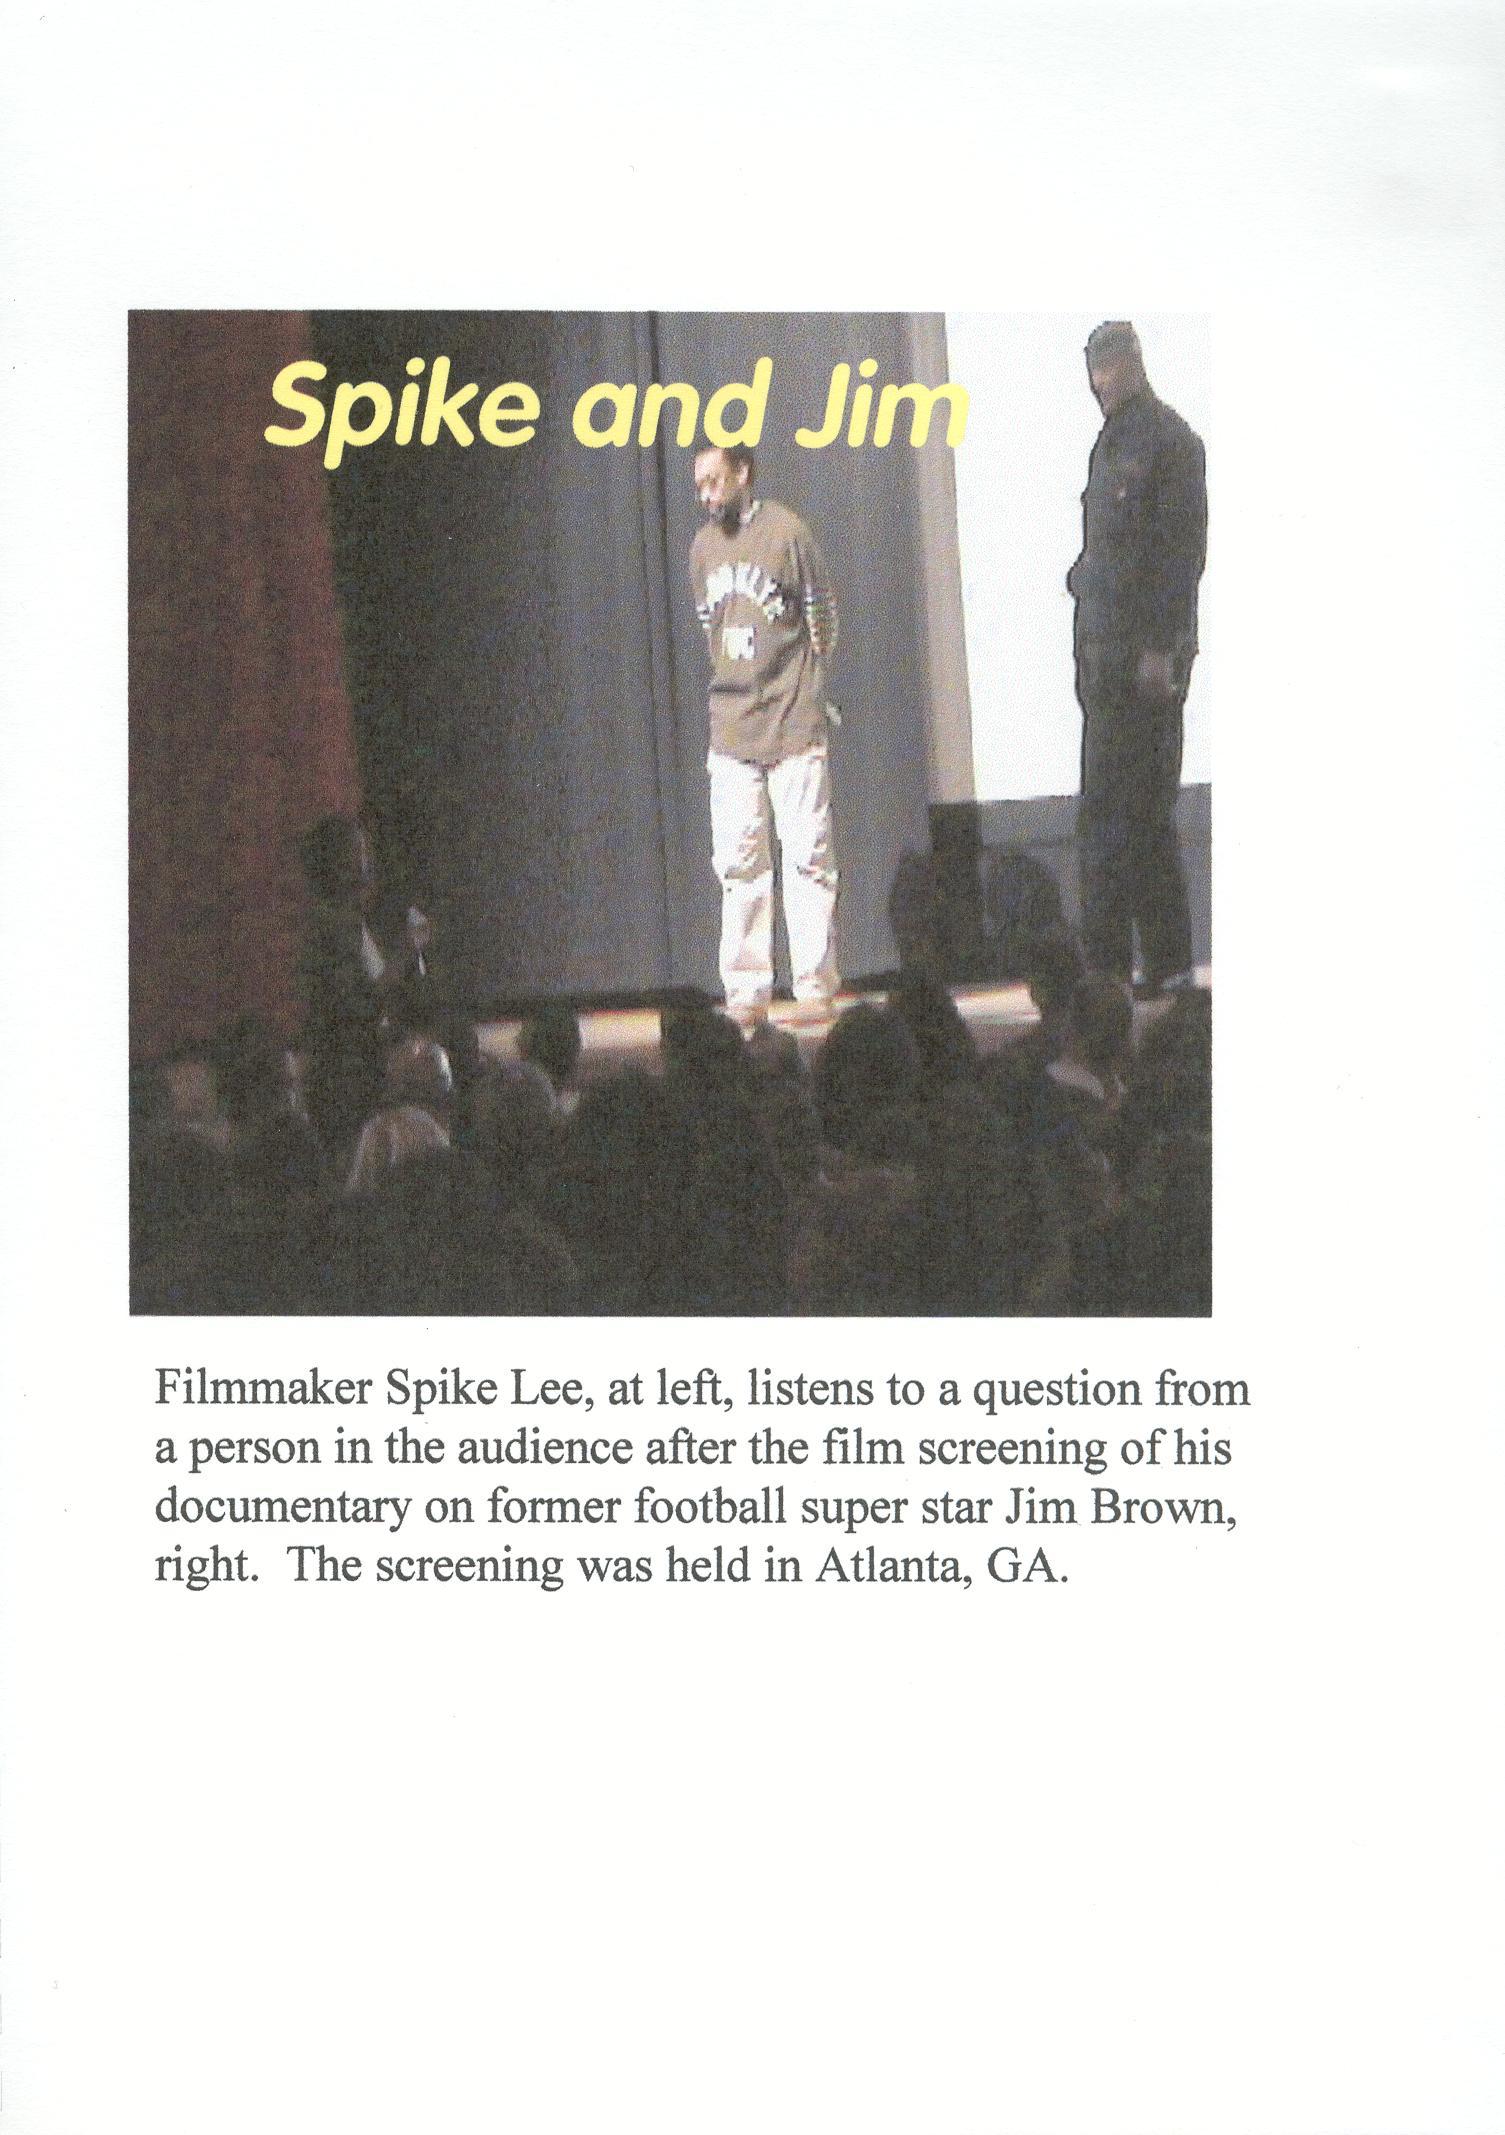 Spike and Jim